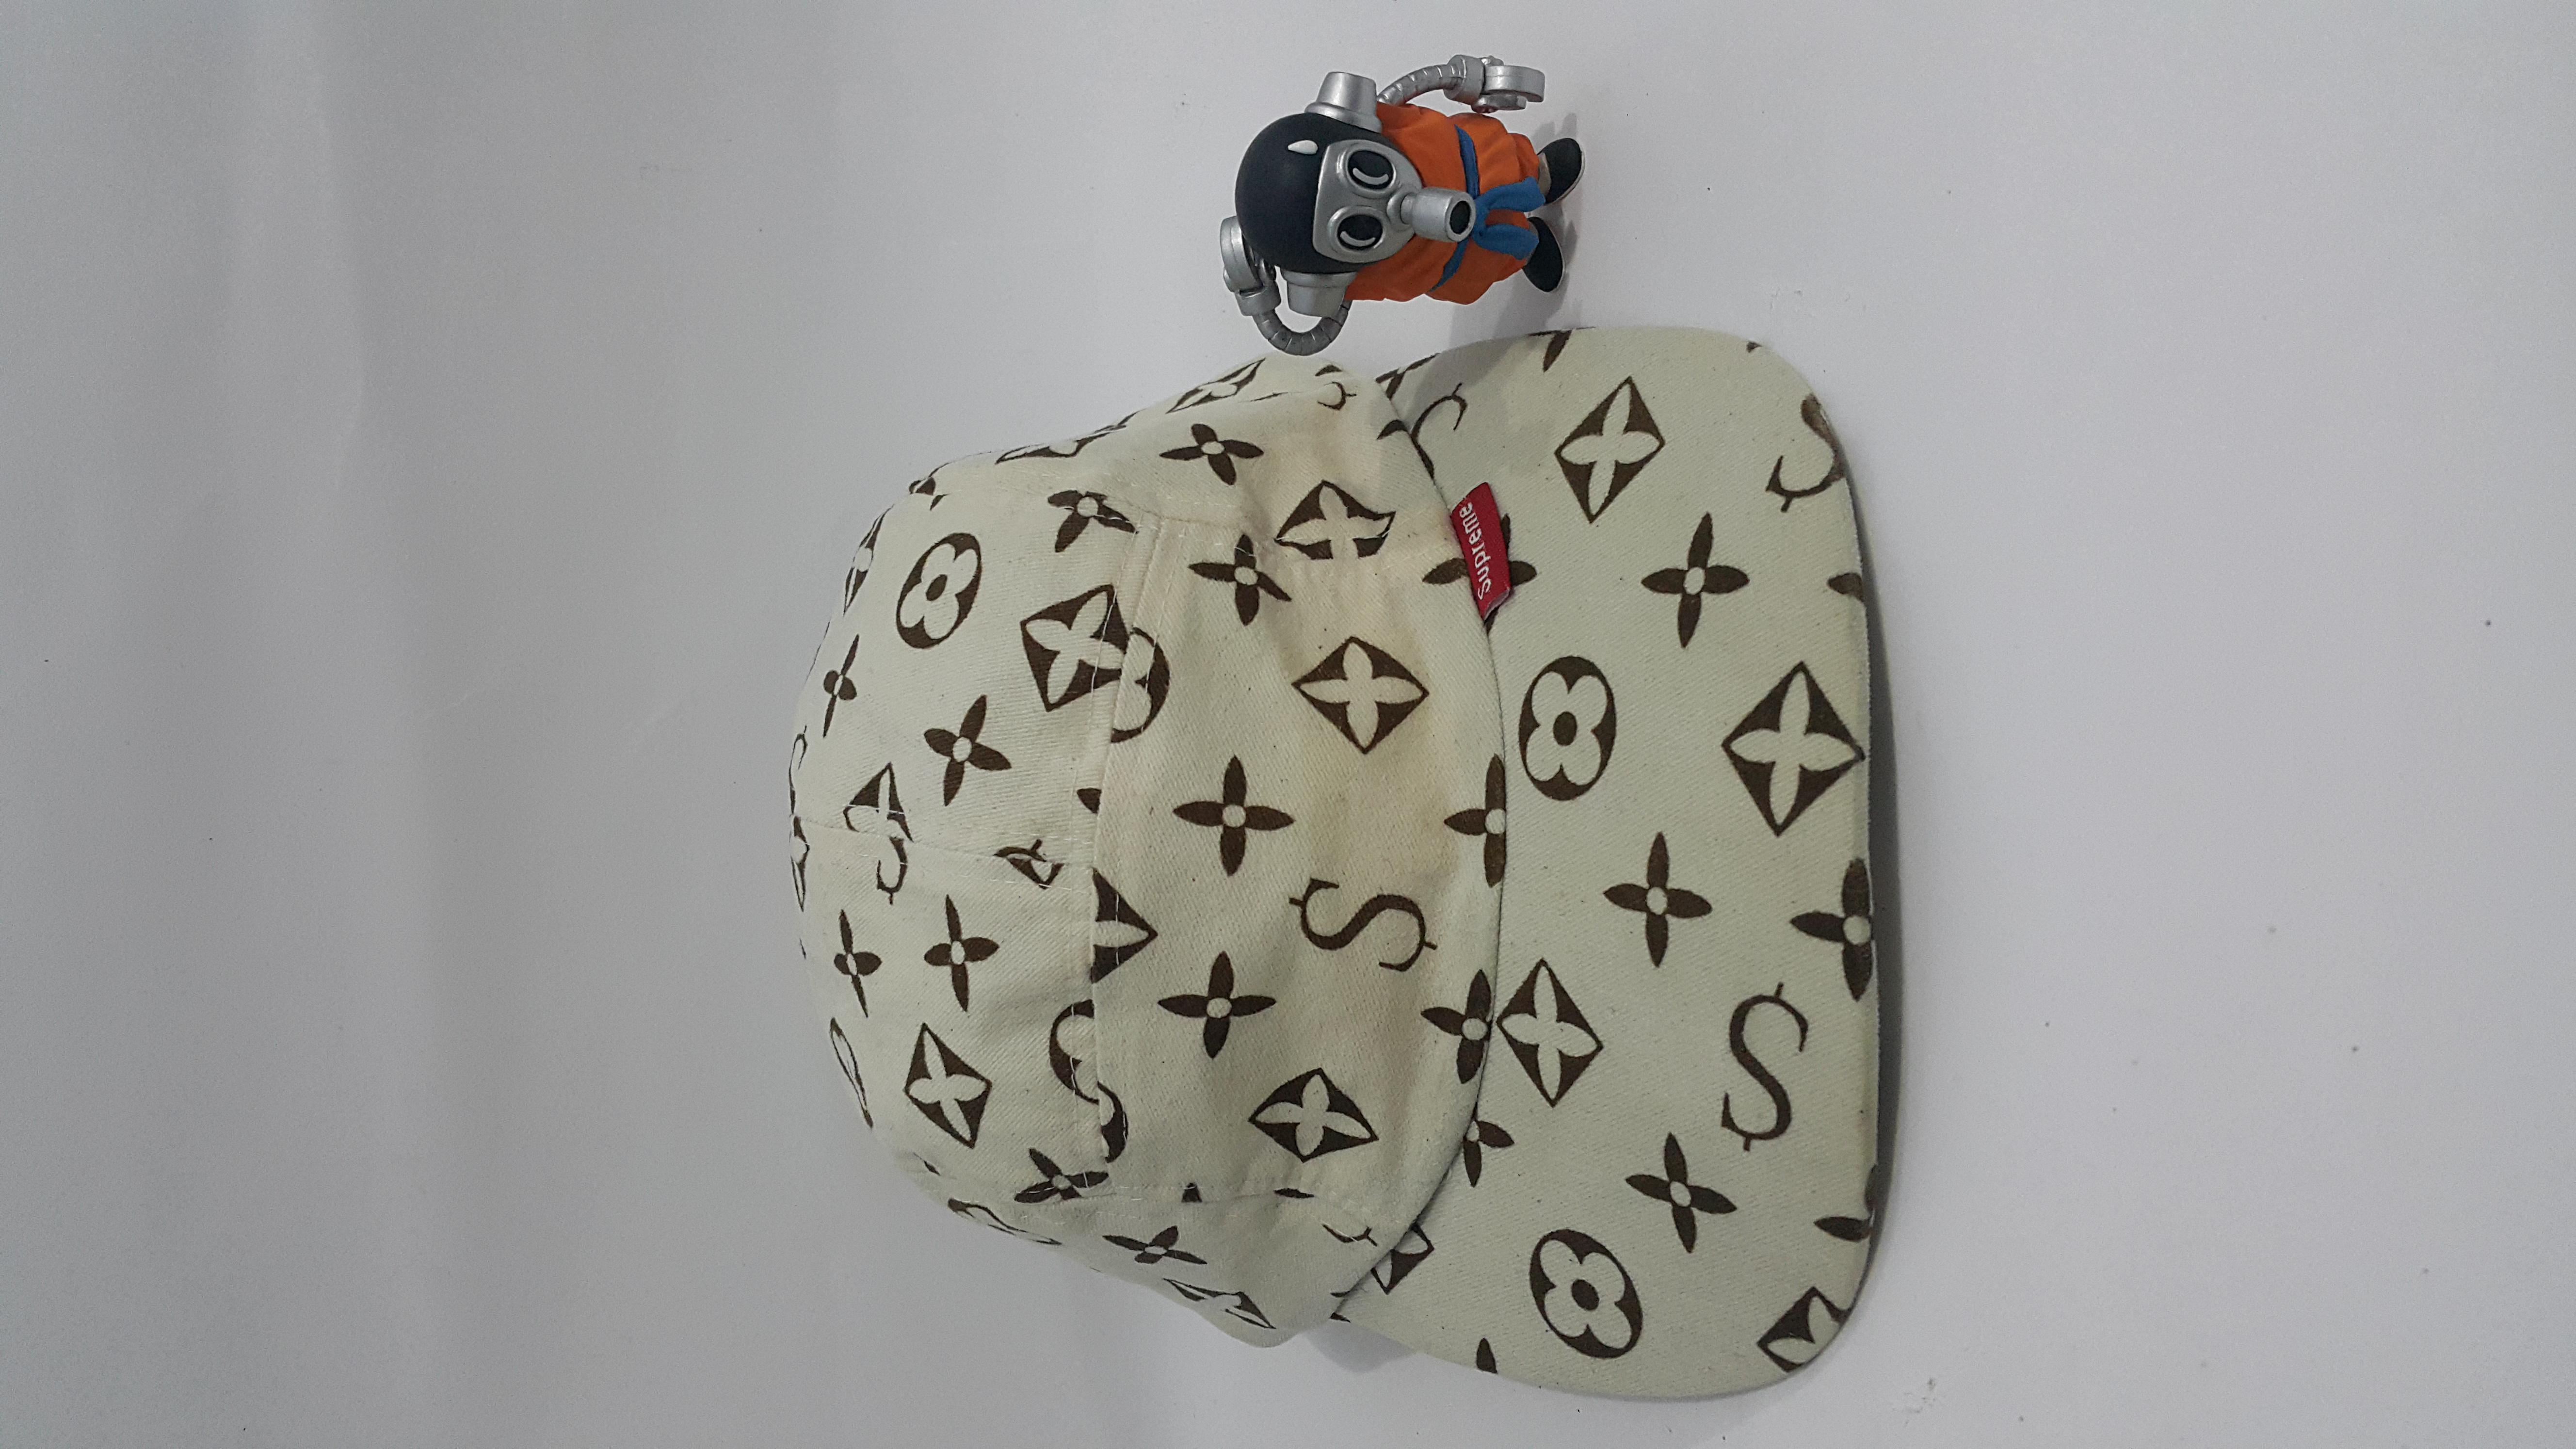 147c841699c Supreme Supreme OG monogram LV camp cap 2000   2001 rare Size one size -  Hats for Sale - Grailed